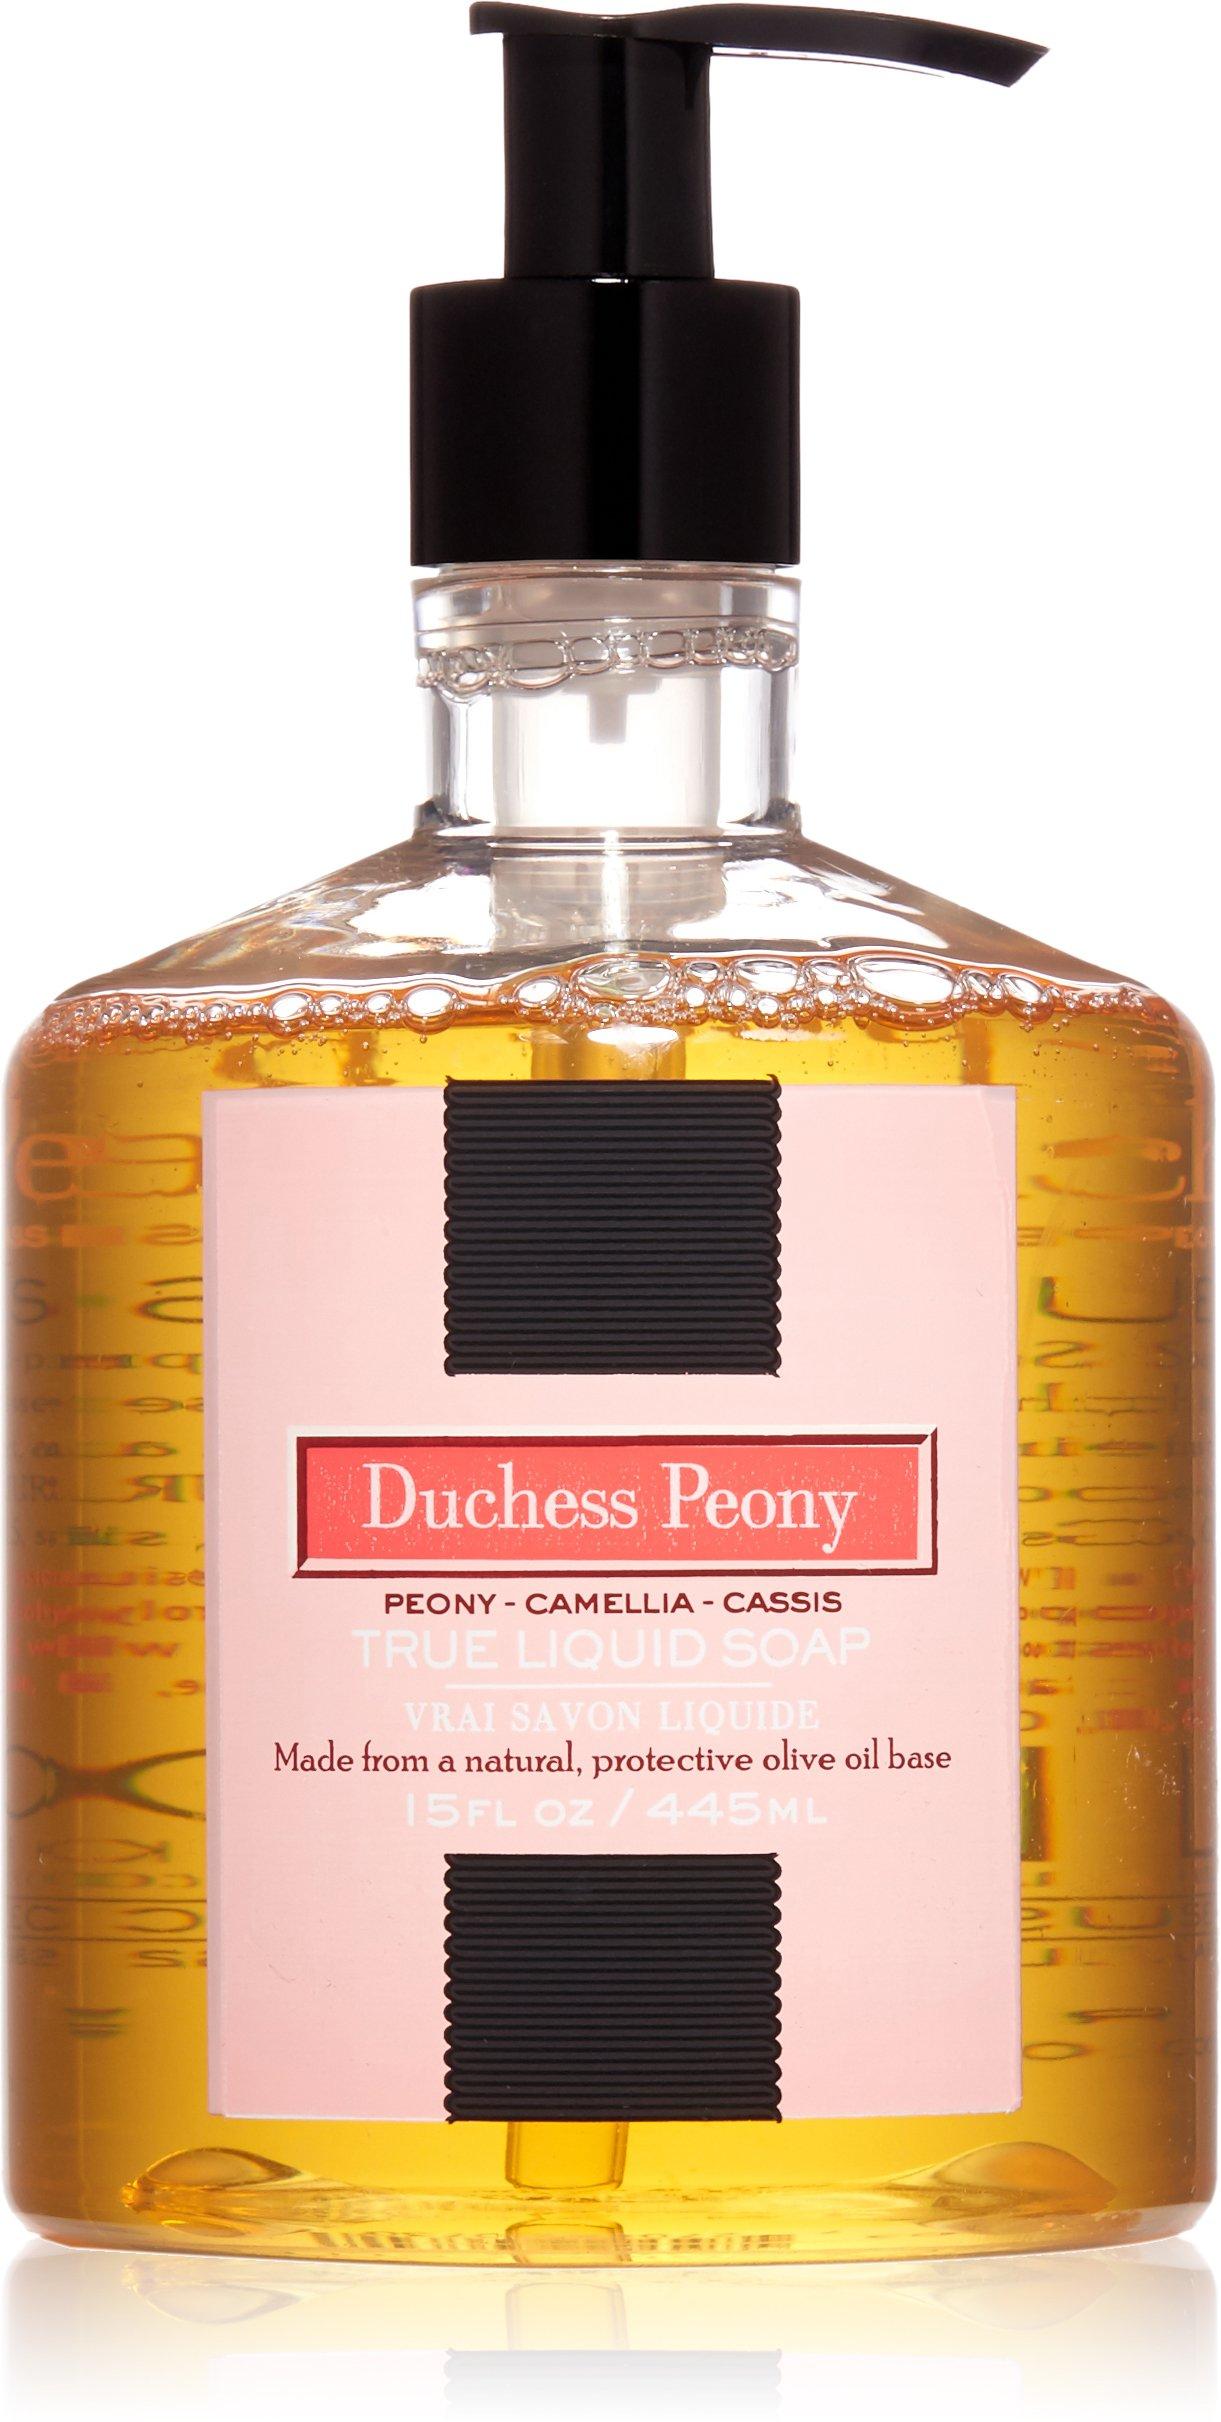 LAFCO House & Home True Liquid Hand Soap, Duchess Peony, 15 Fl Oz